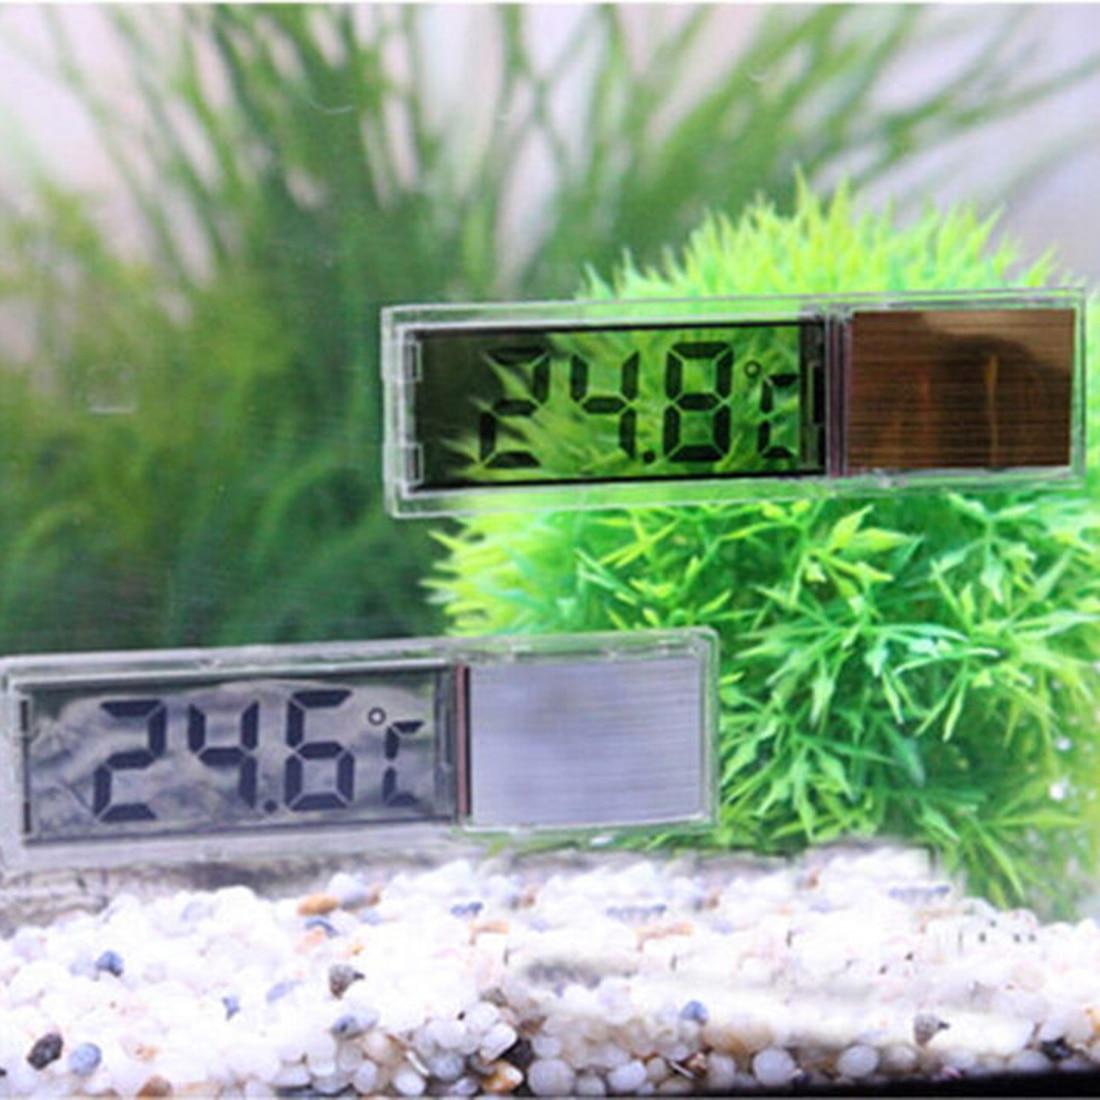 Multi Function Lcd 3D Crystal Digital Electronic Temperature Measurement Fish Tank Aquarium Thermometer Random Color